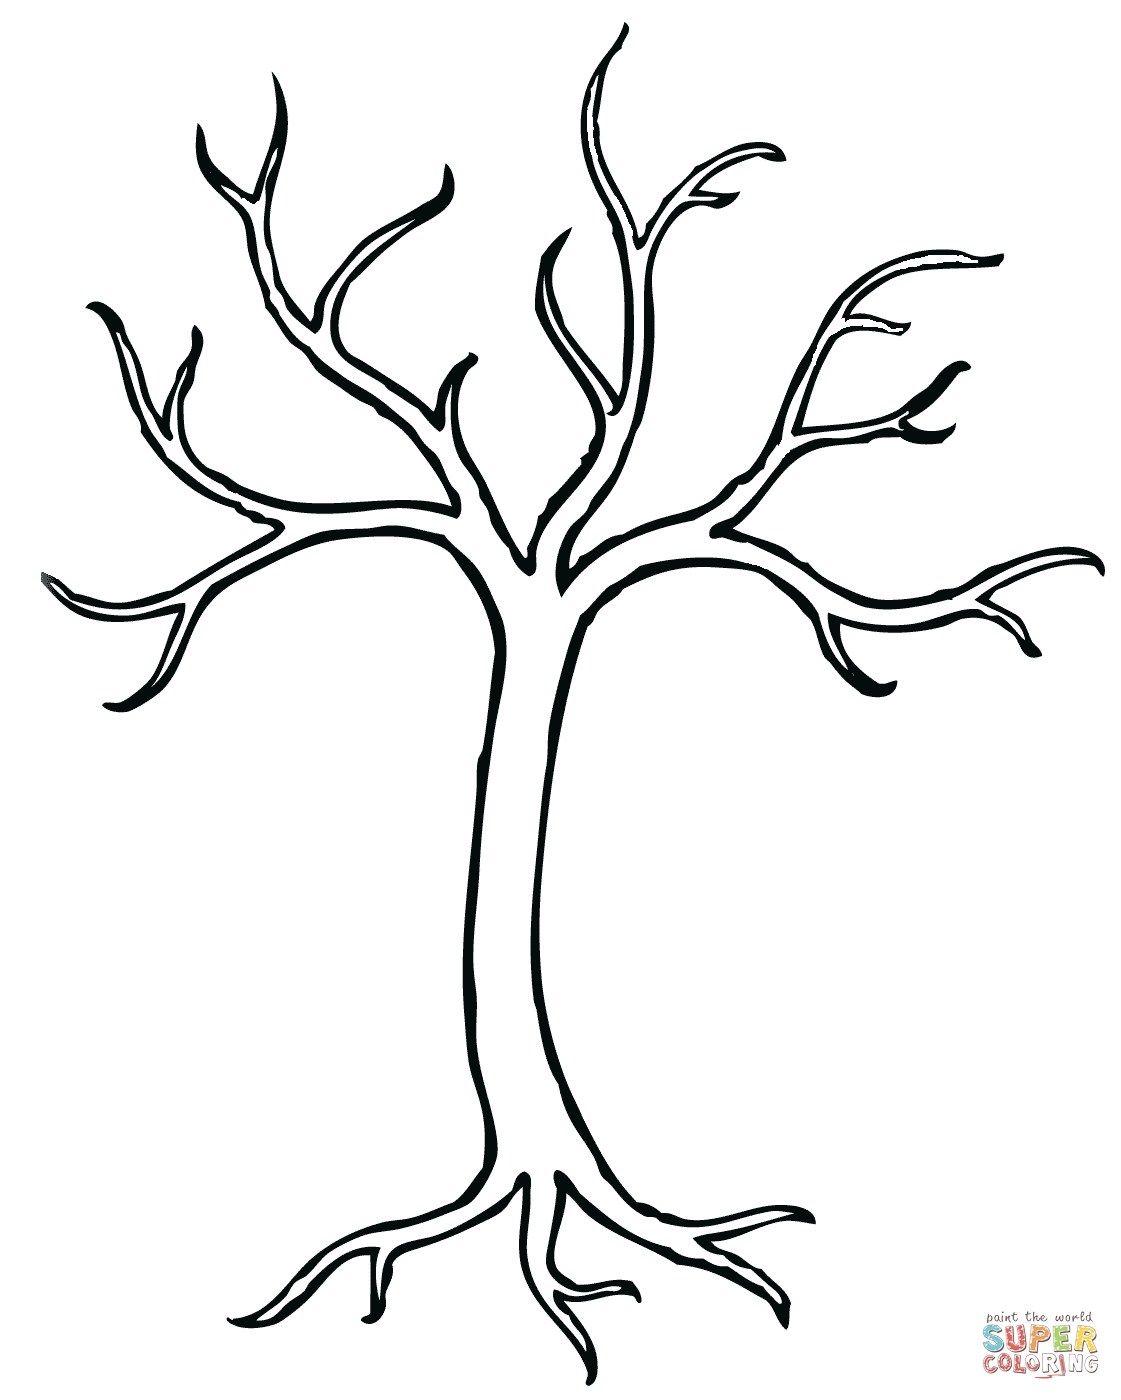 Malvorlagen Baum Baum Vorlage Malvorlagen Vorlagen